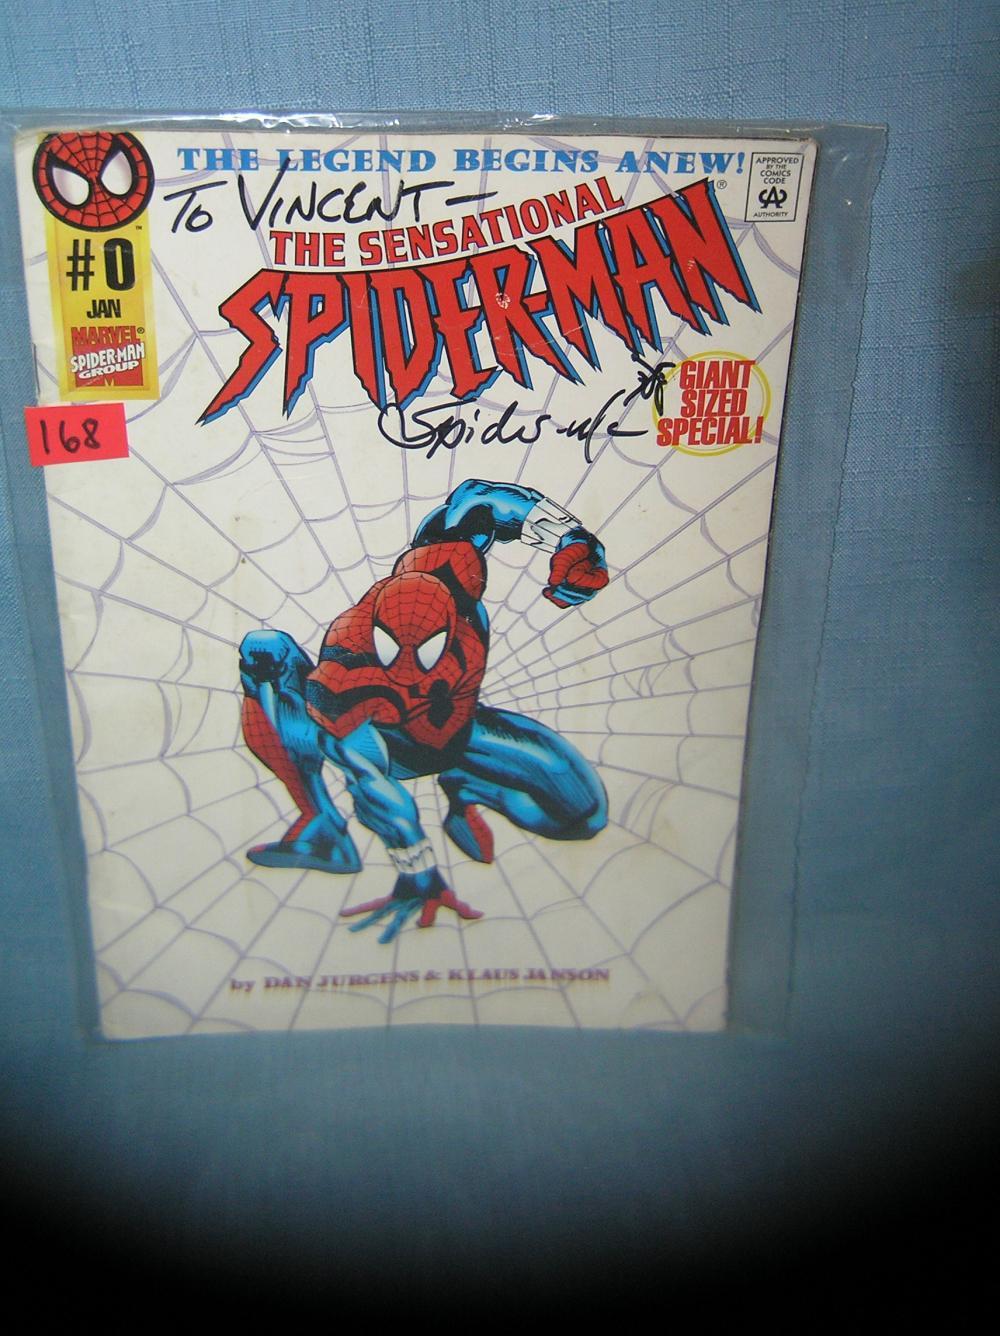 Lot 168: VINTAGE AUTOGRAPHED MARVEL SPIDERMAN COMIC BOOK